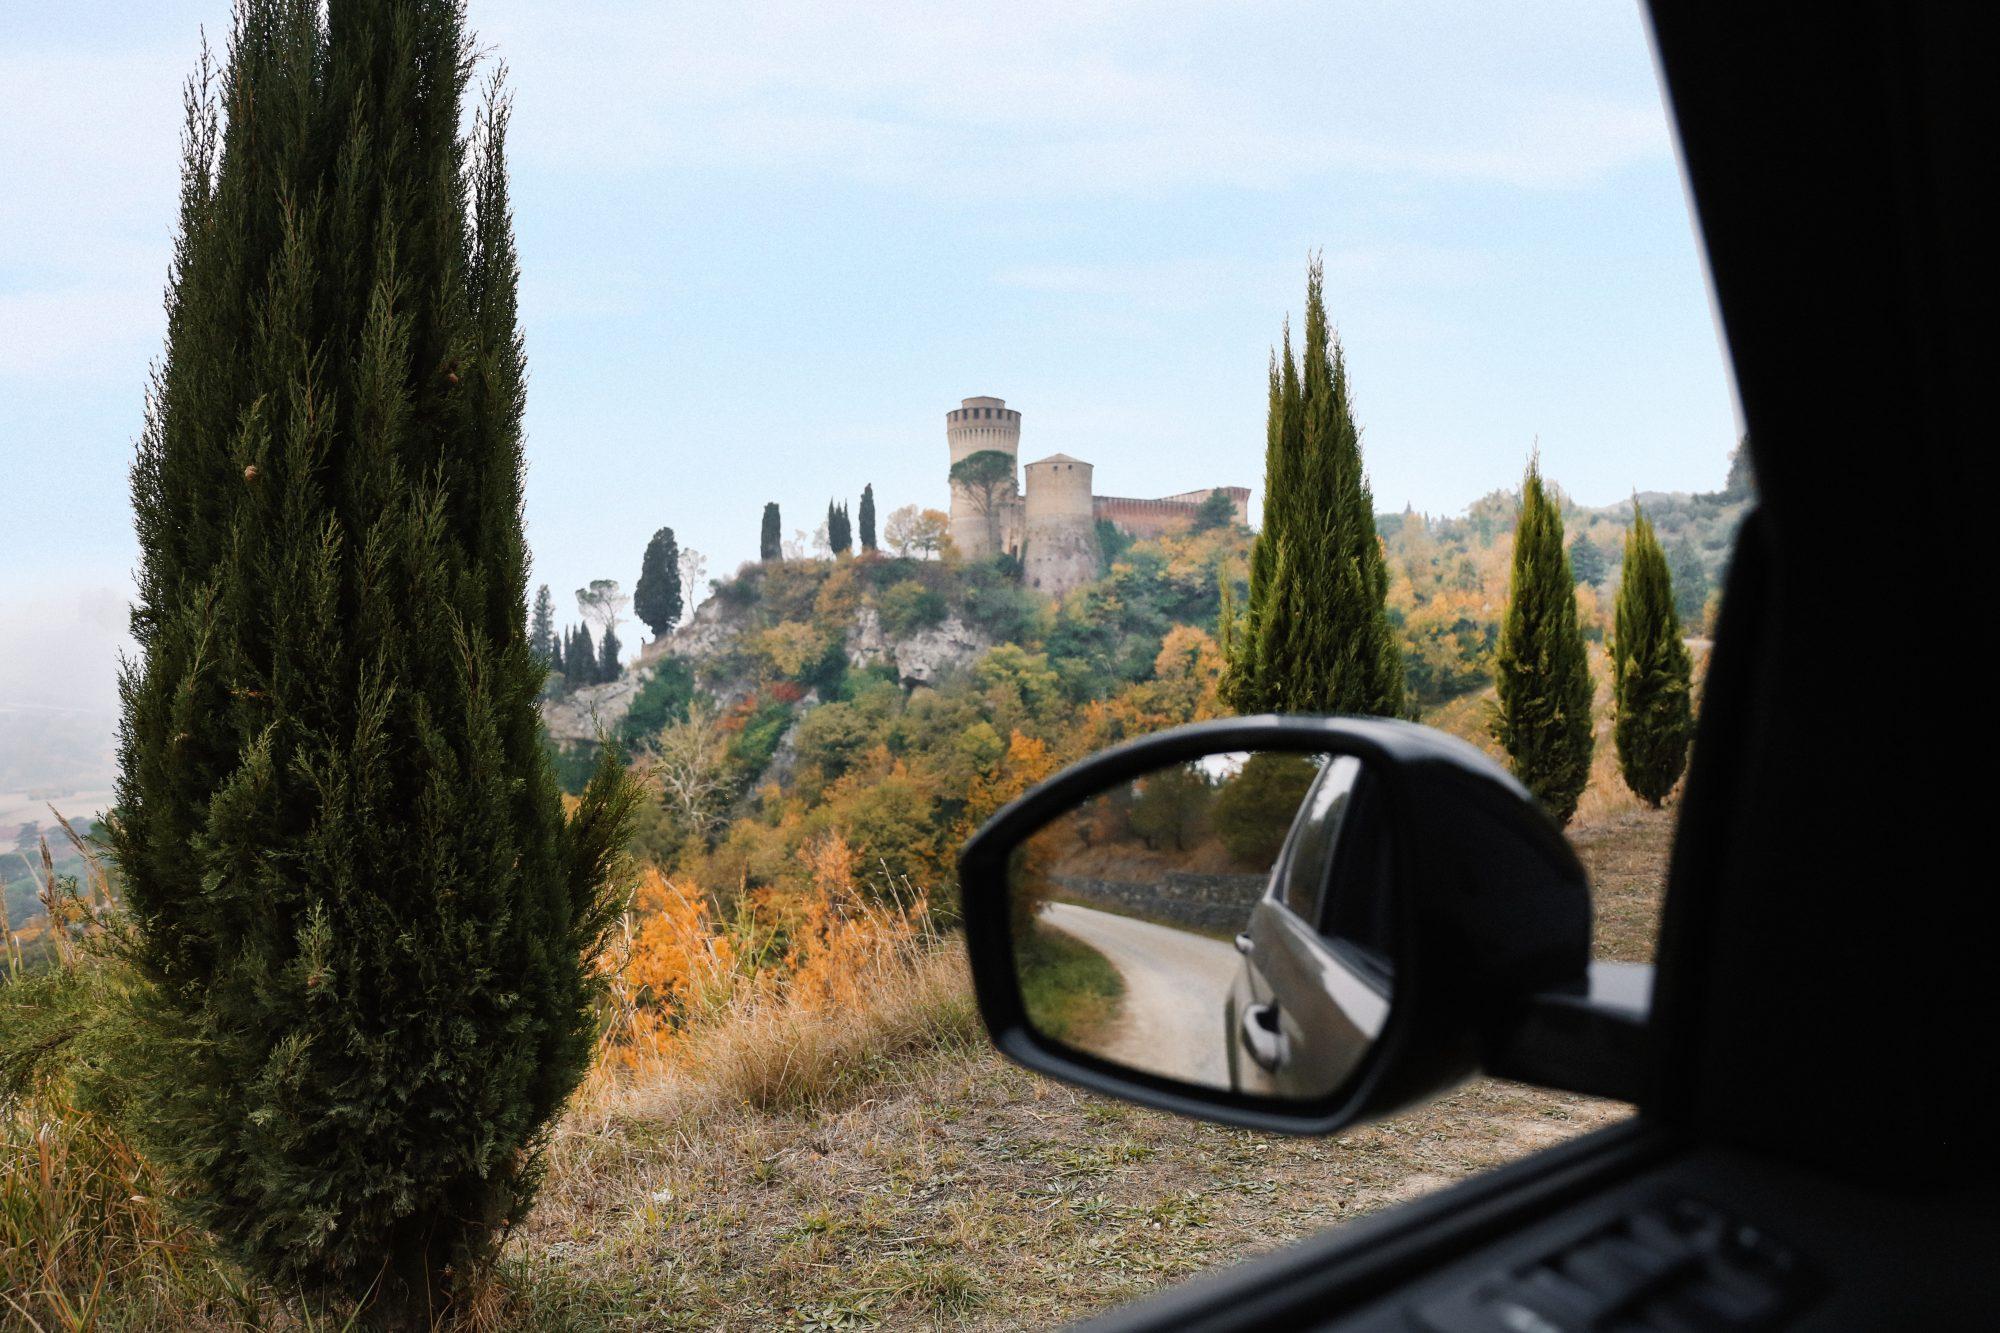 LandOutriders - Un weekend in Romagna con Pier Giulio Caivano | Collater.al 1